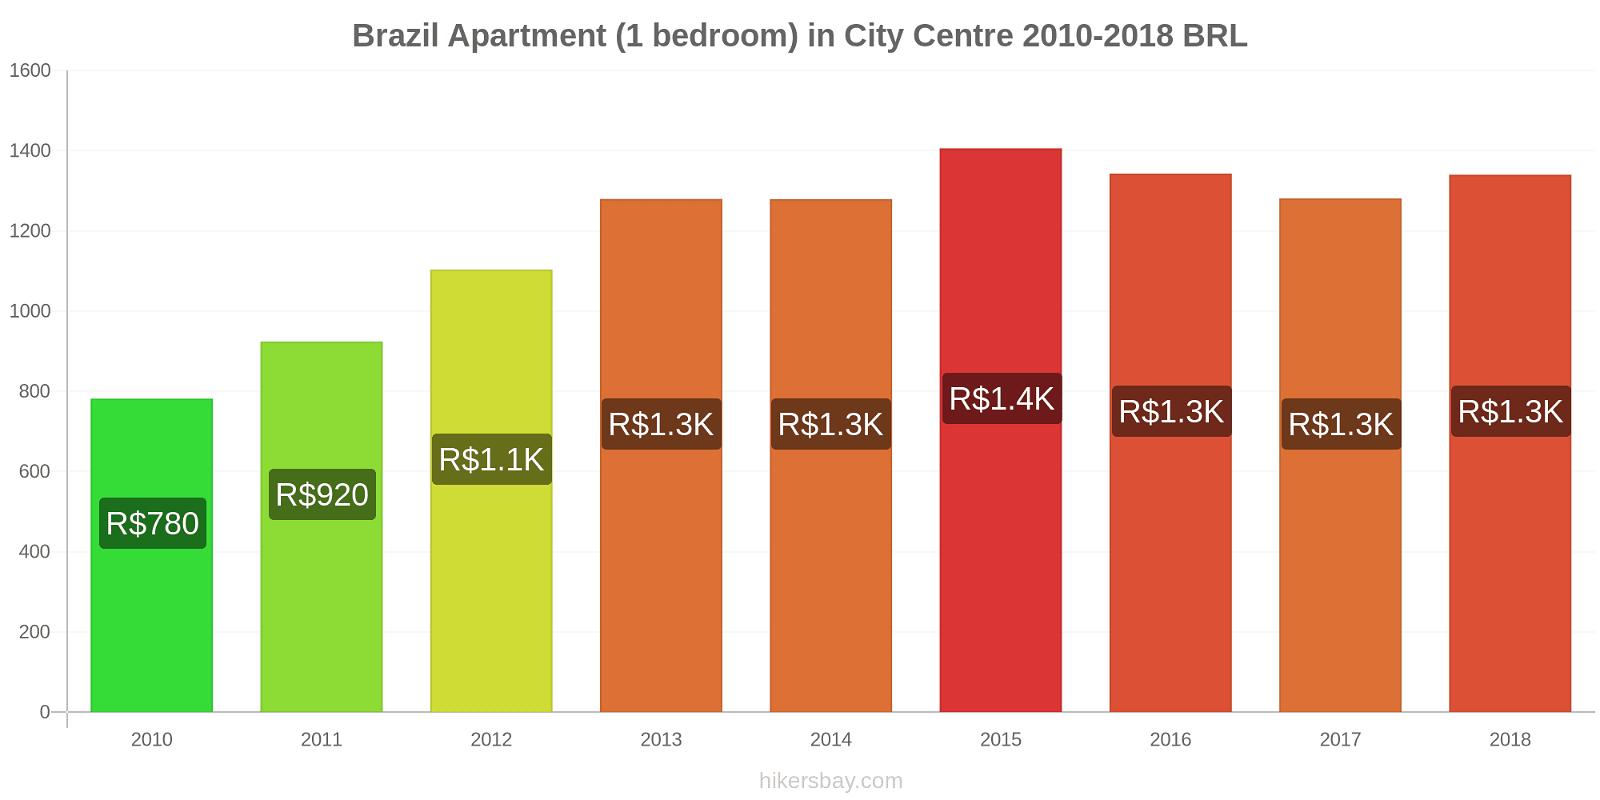 Brazil price changes Apartment (1 bedroom) in City Centre hikersbay.com